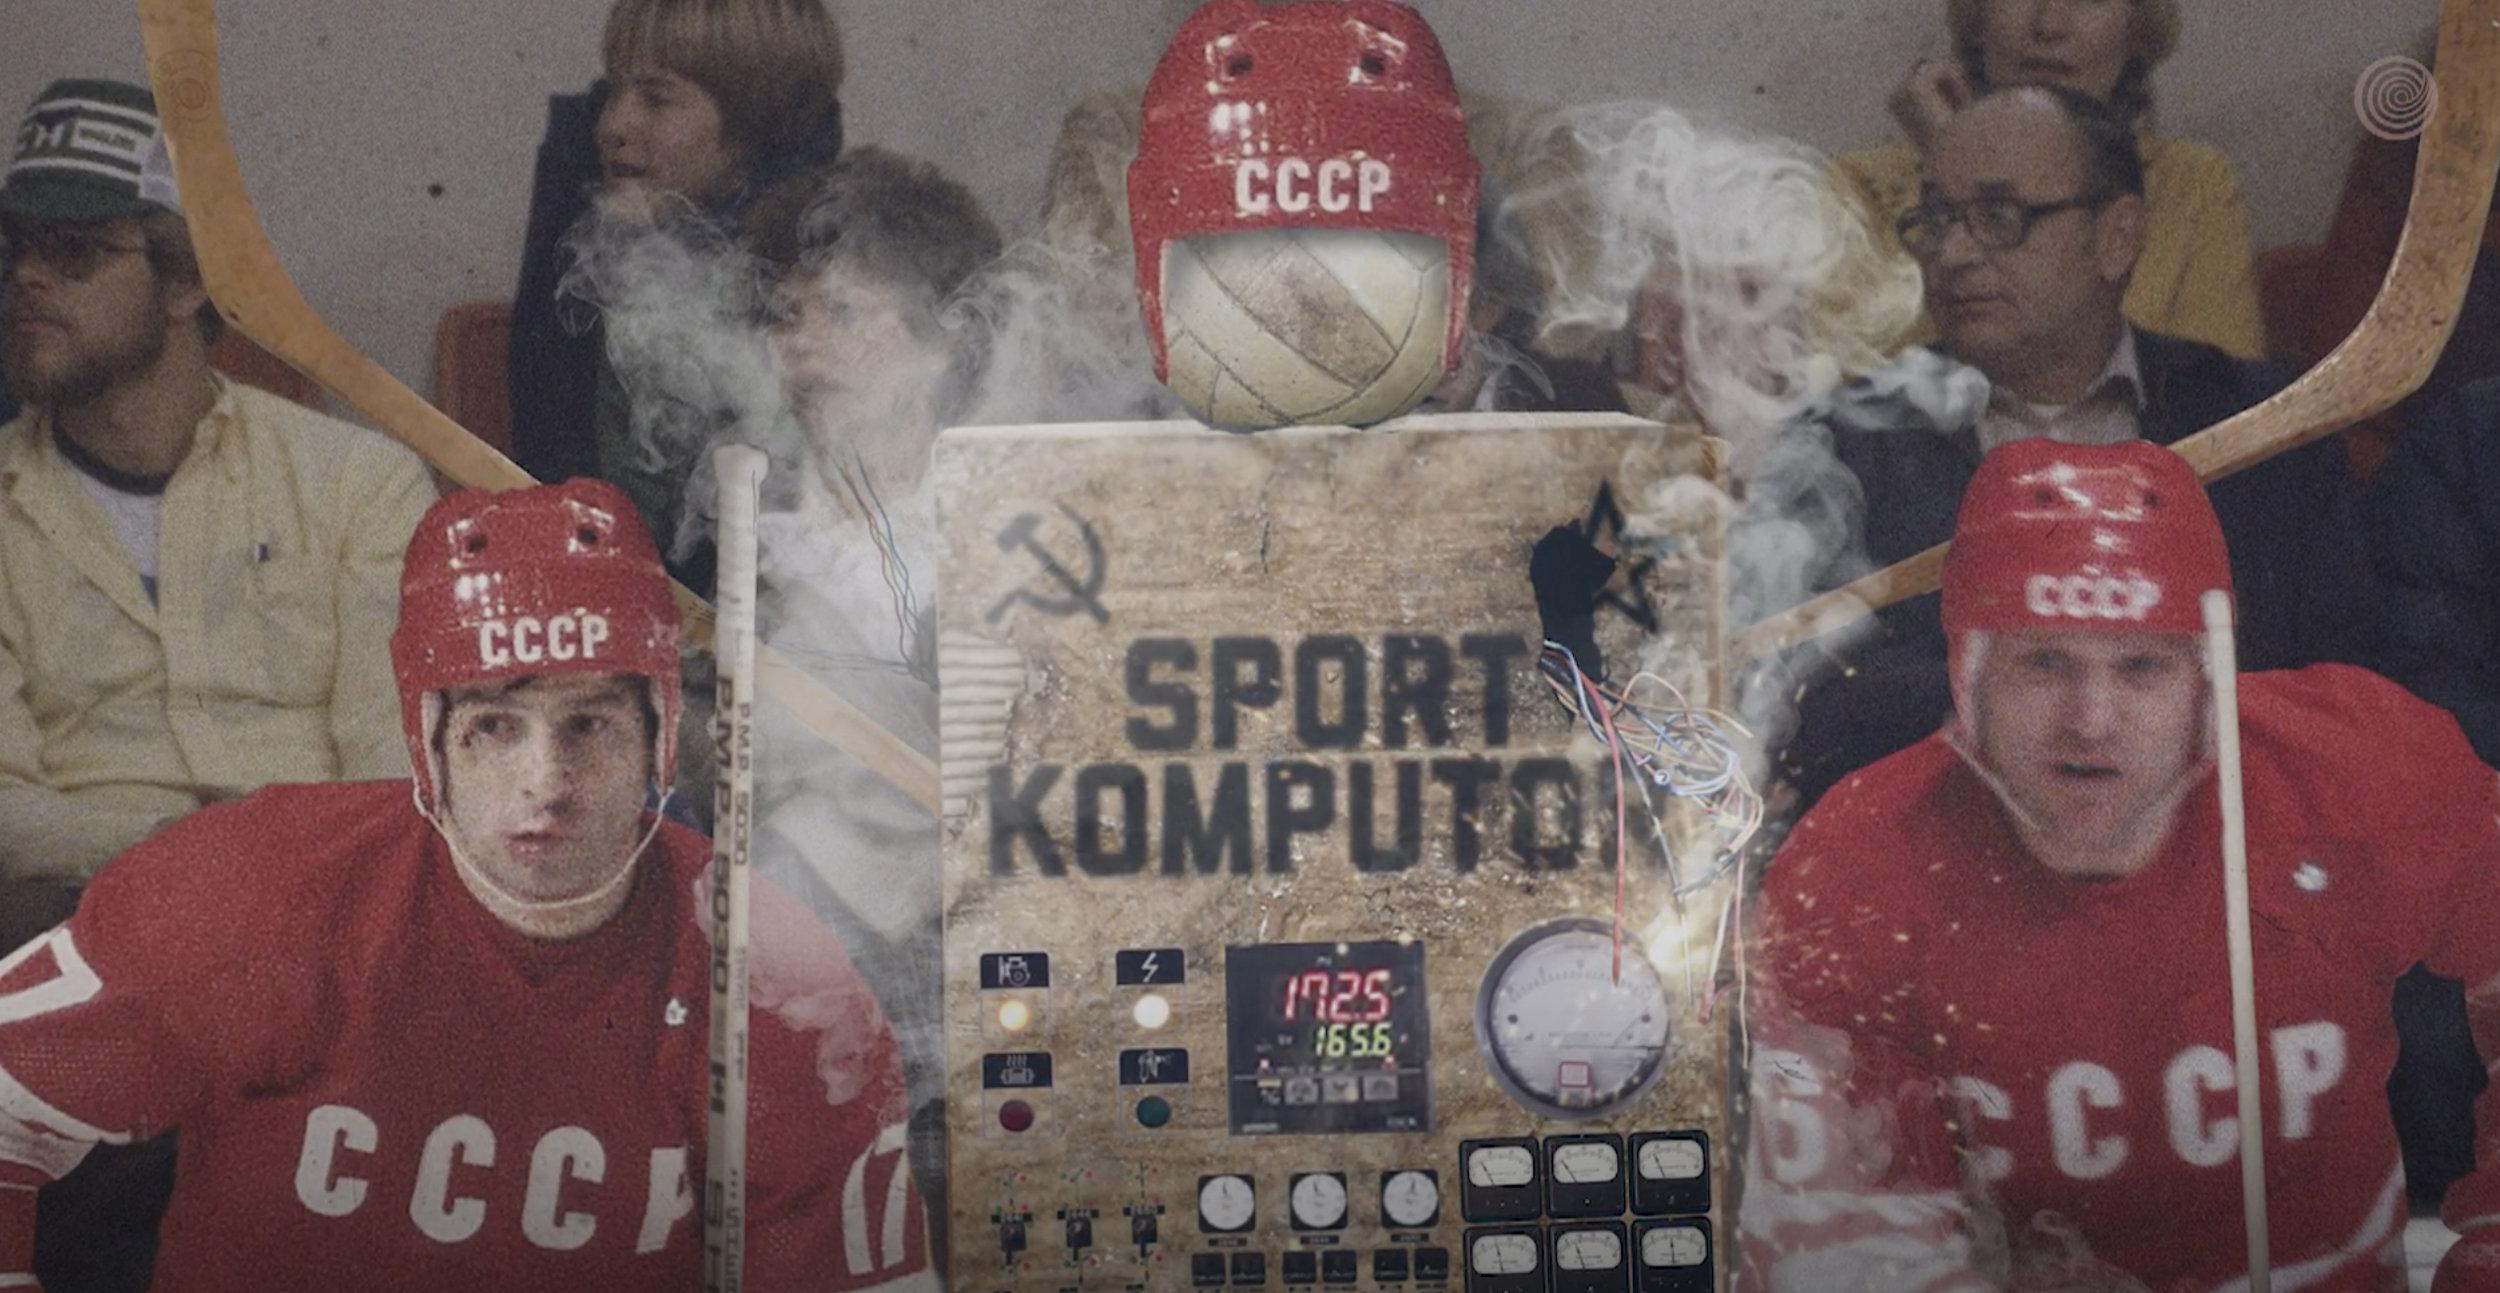 Sports Komputer.jpg